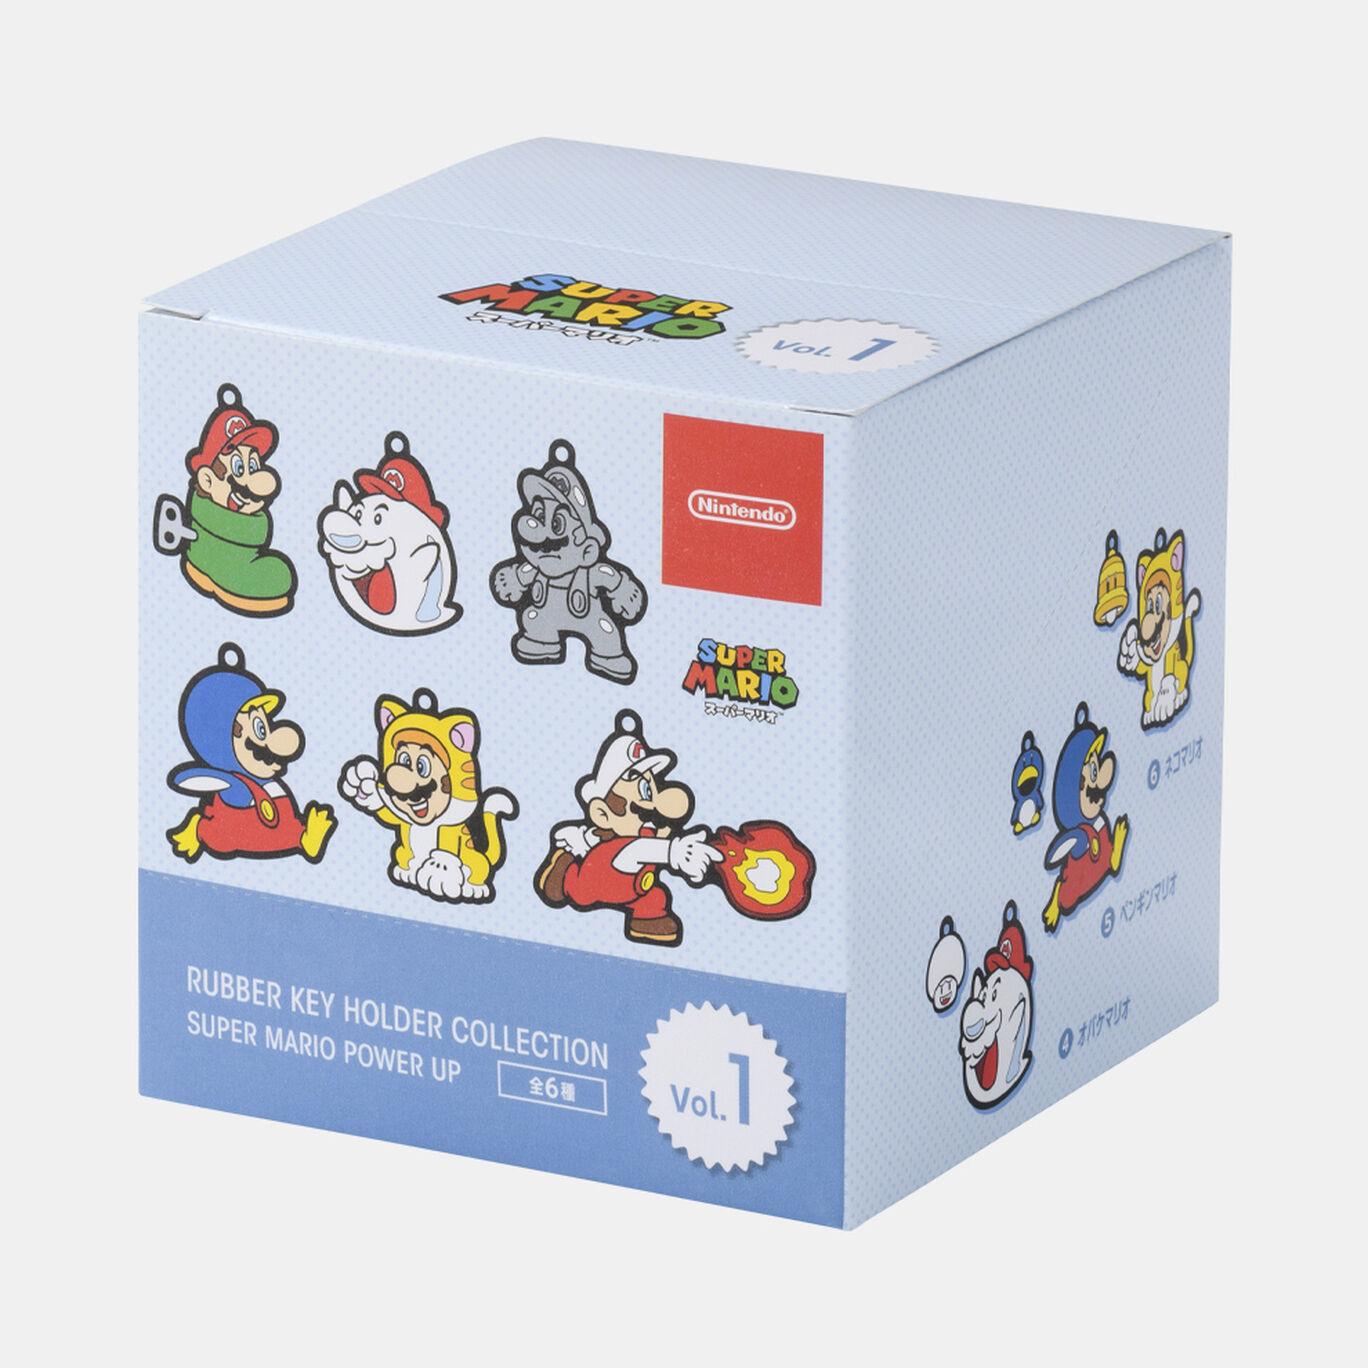 【BOX商品】ラバーキーホルダーコレクション スーパーマリオ パワーアップ 第一弾【Nintendo TOKYO取り扱い商品】